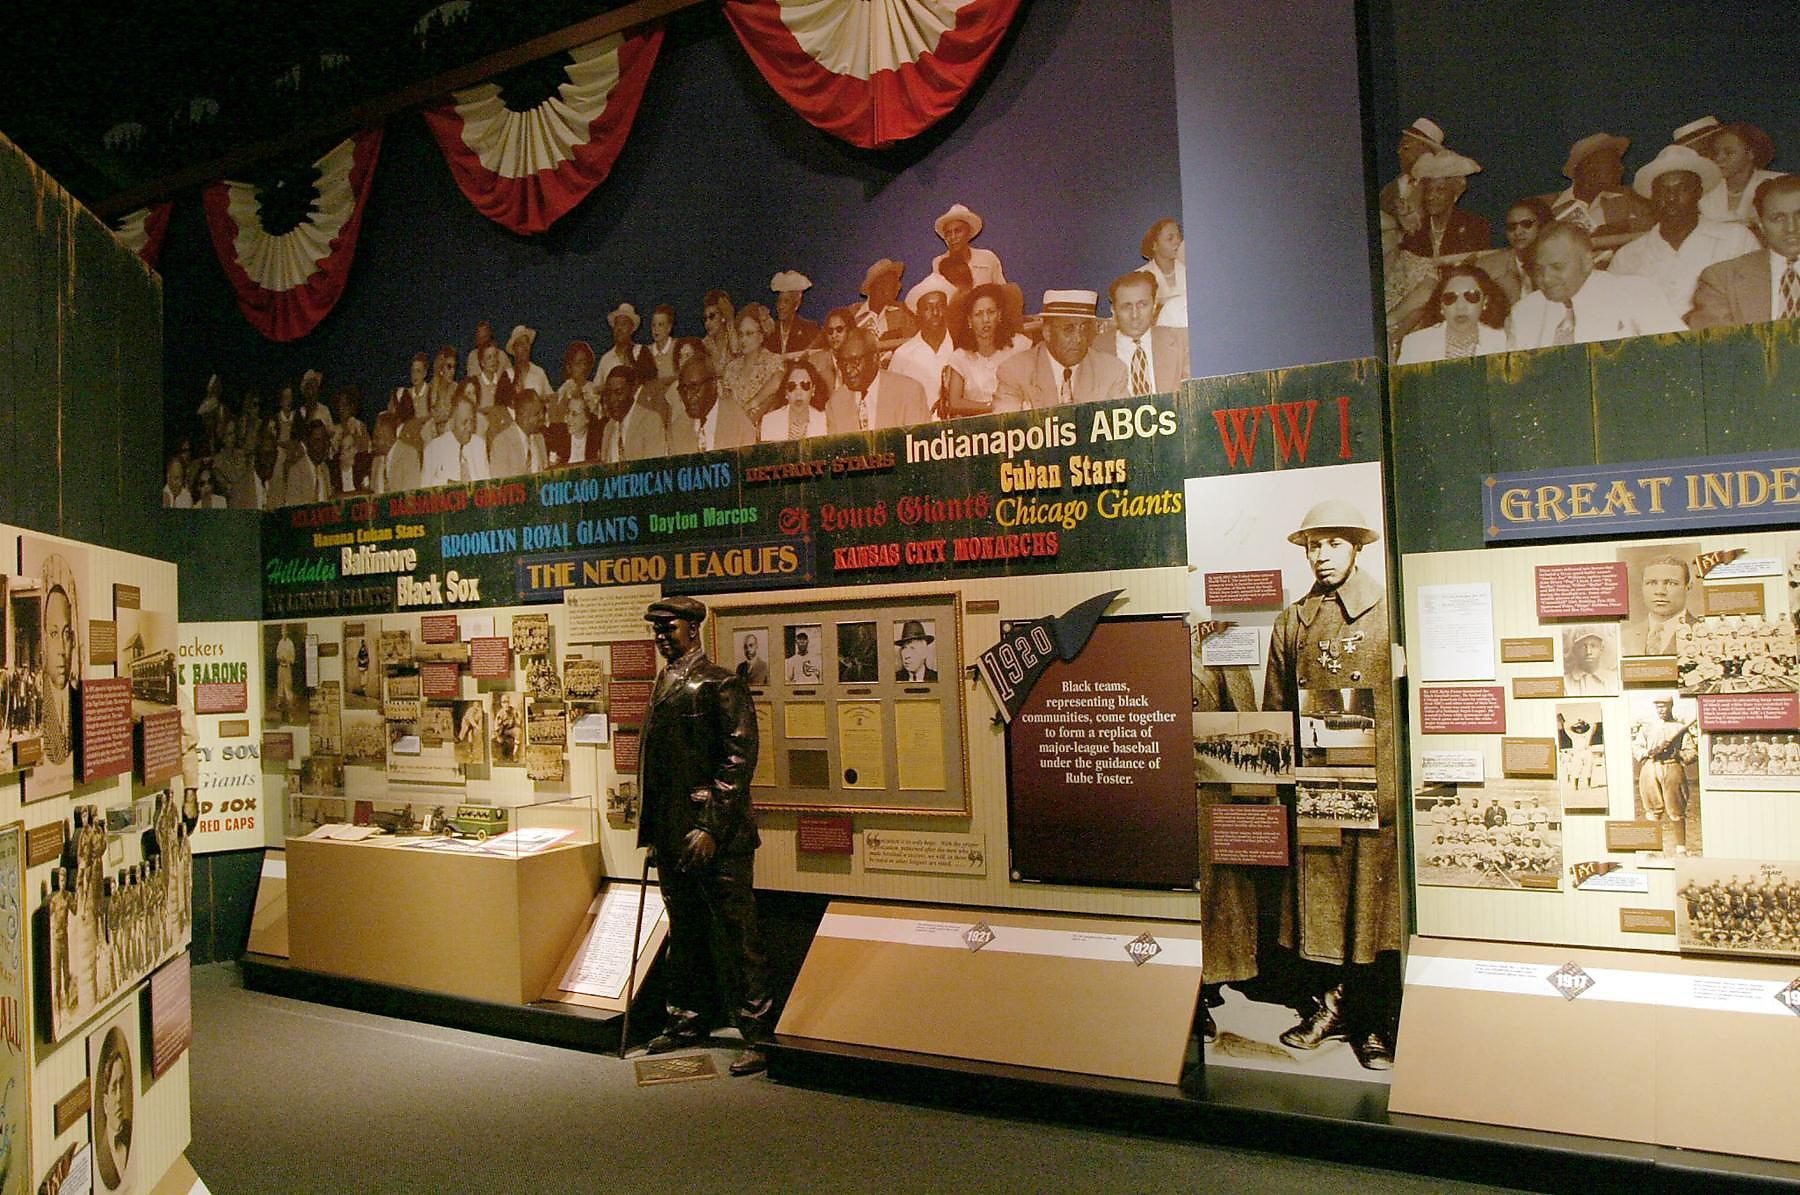 MLB, MLBPA make seconnd $1M donation to Negro Leagues Baseball Museum